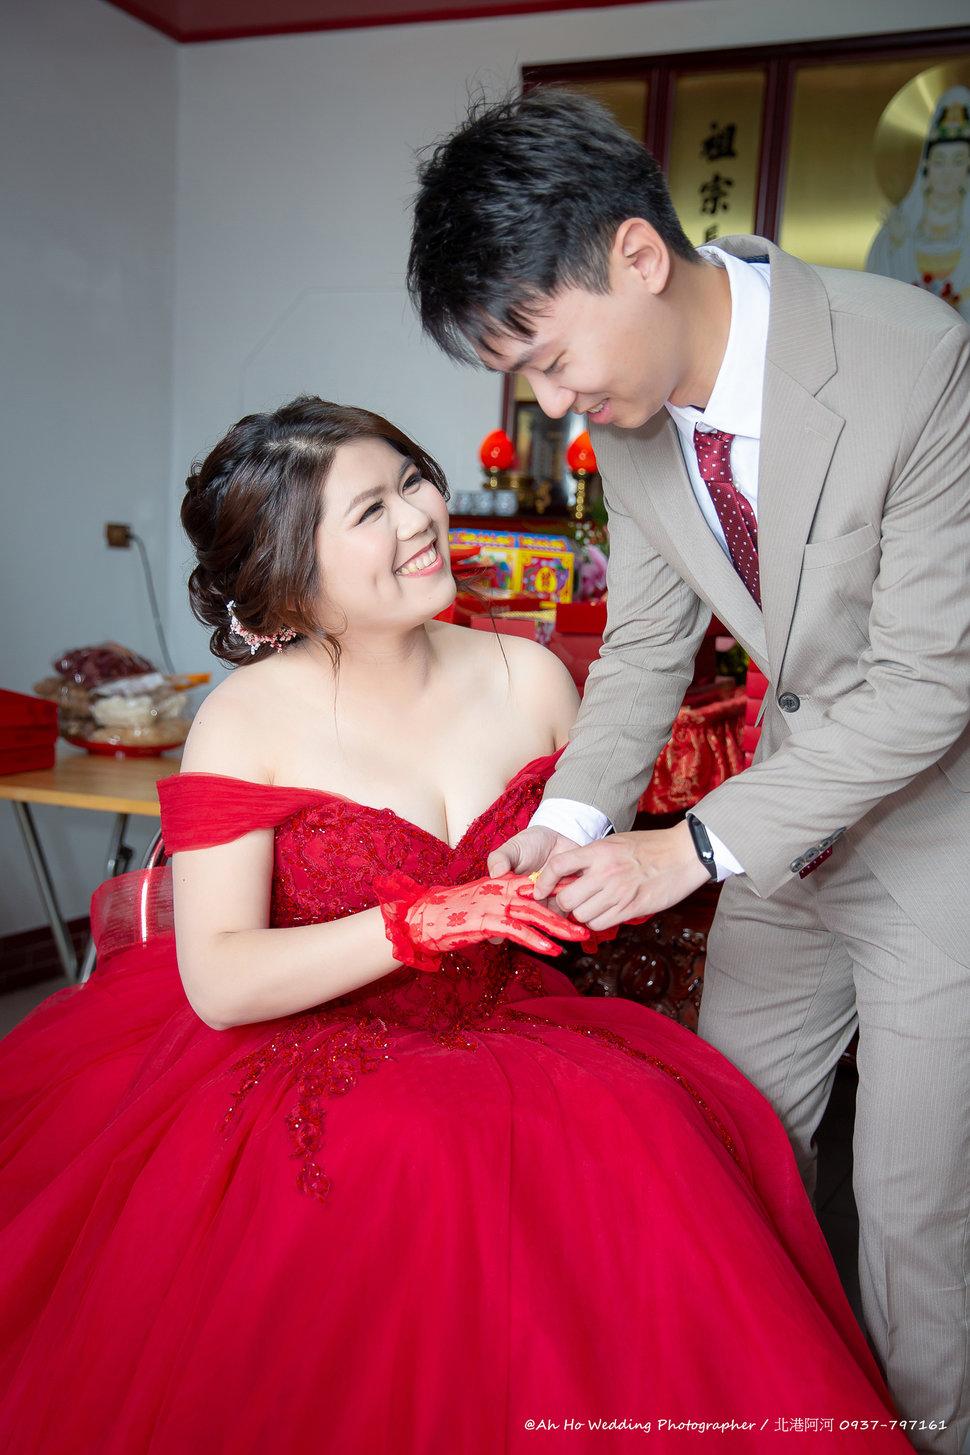 AhHo Wedding TEL-0937797161 lineID-chiupeiho-82 - 北港阿河婚攝 AhHoWedding - 結婚吧